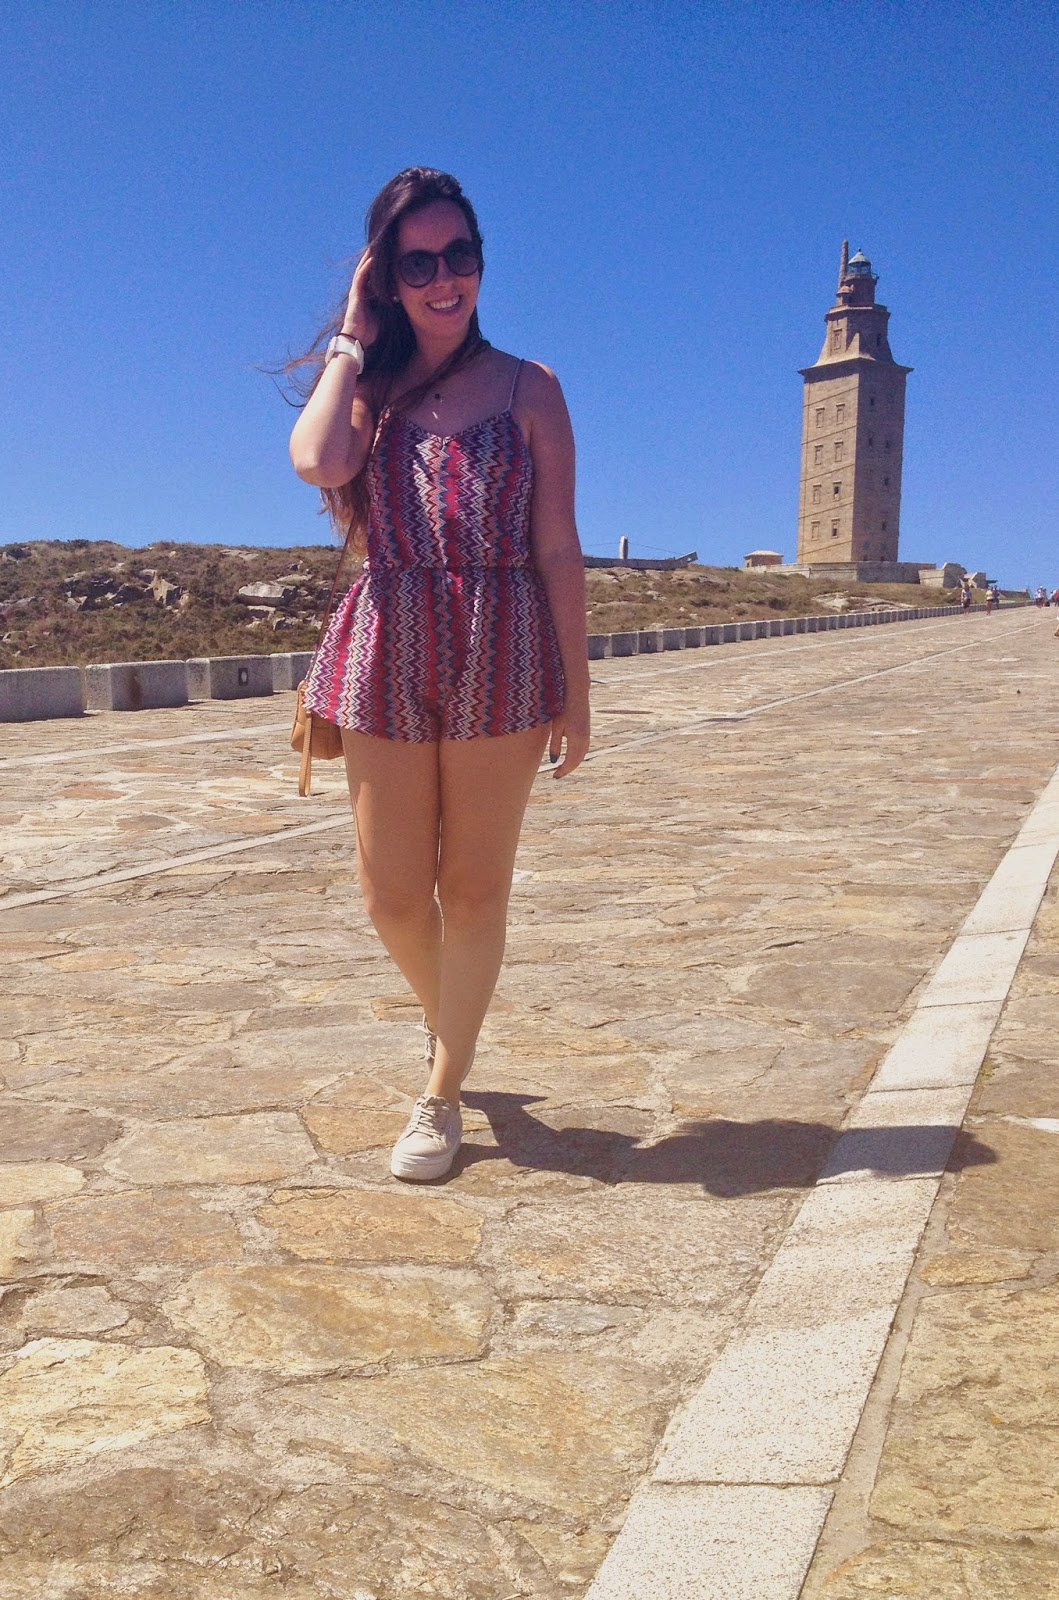 hey vicky hey, victoria suarez, blogger, coruña, verano, summer